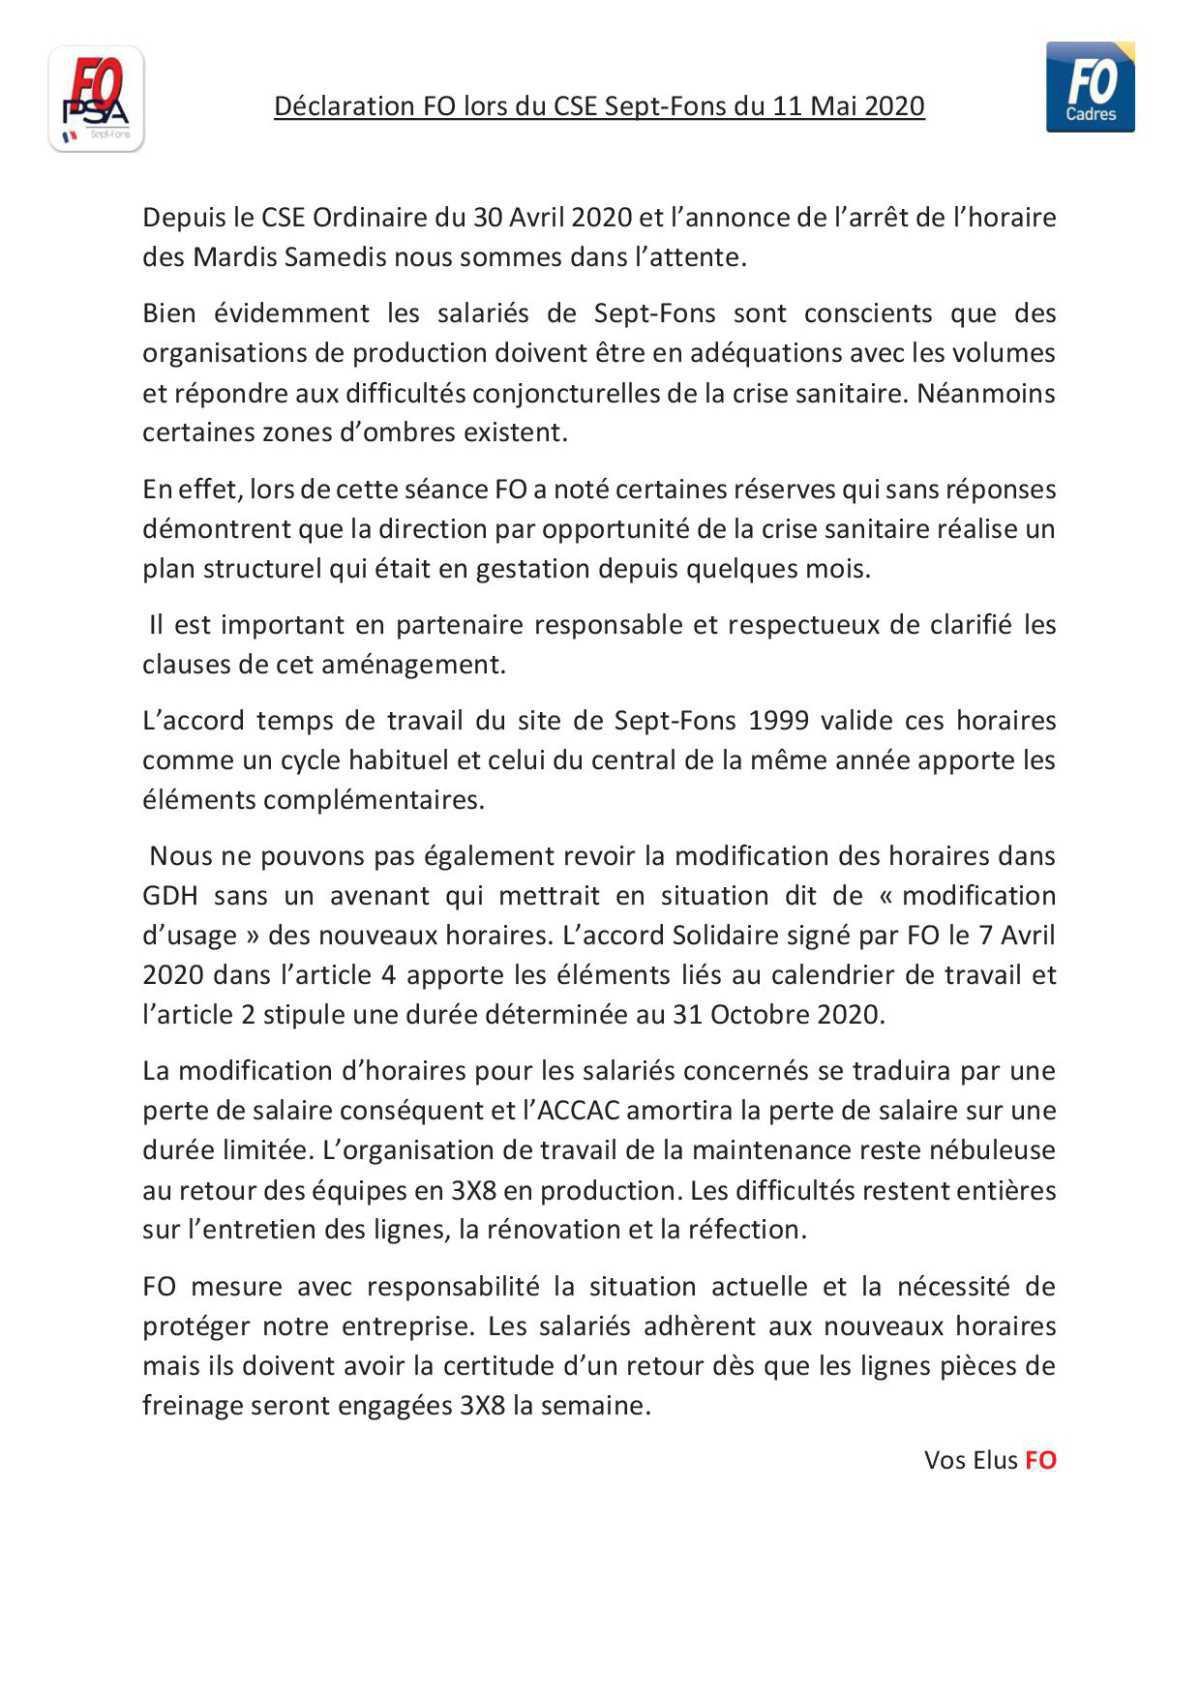 CSE Extra du 11 Mai 2020